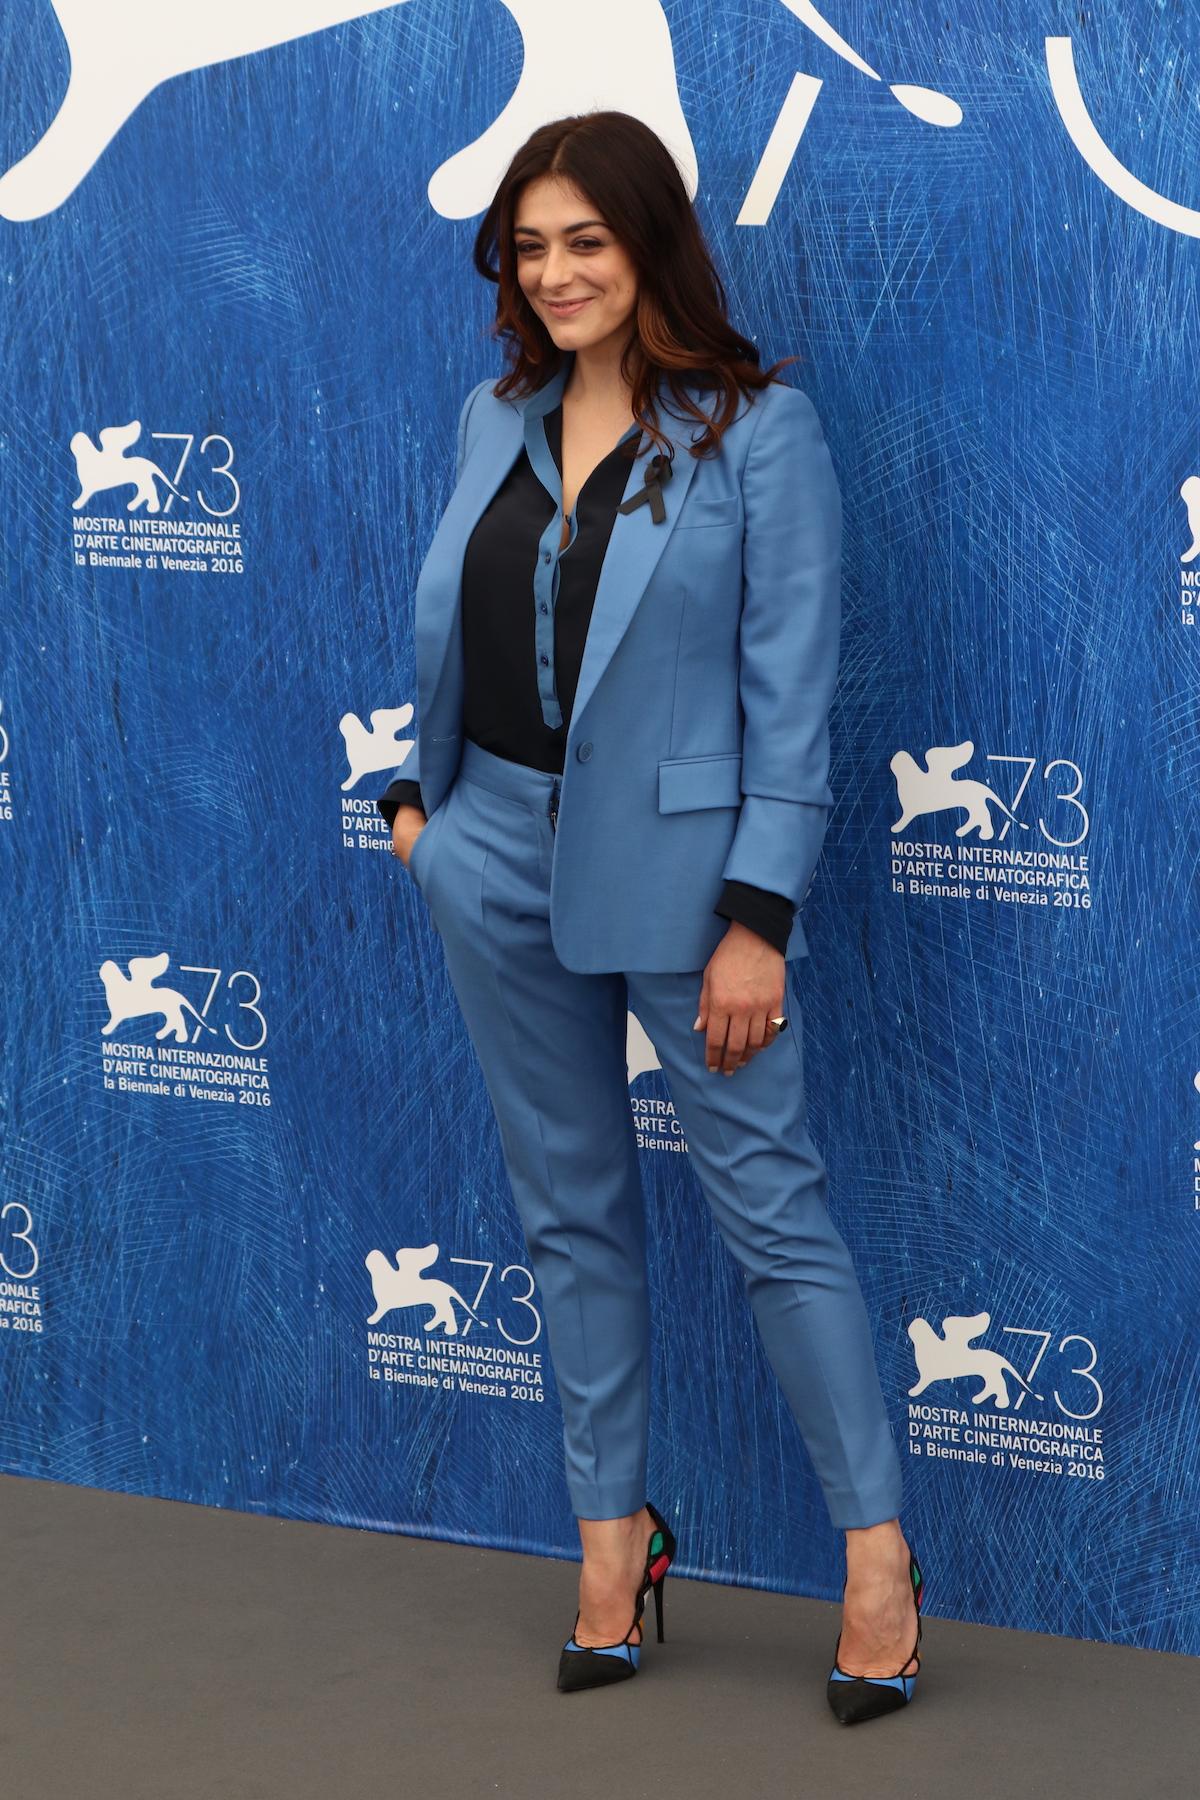 Venezia 2016: Valentina Lodovini posa al photocall delle giurie